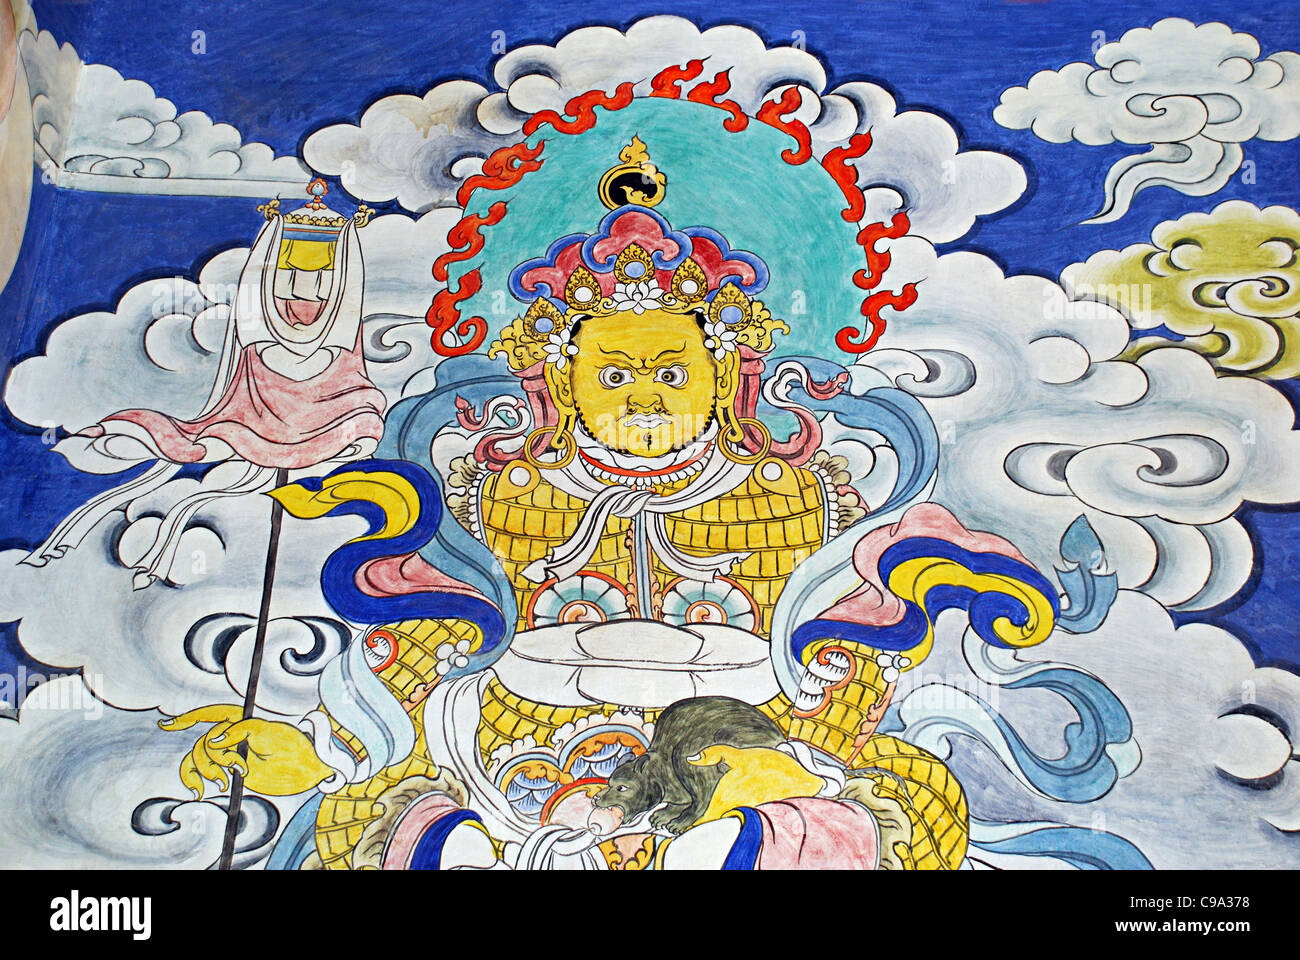 Mural Painting on the wall. Hemis Gompa a Tibetan Buddhist monastery of the Drukpa Lineage, located in Hemis, Ladakh, - Stock Image